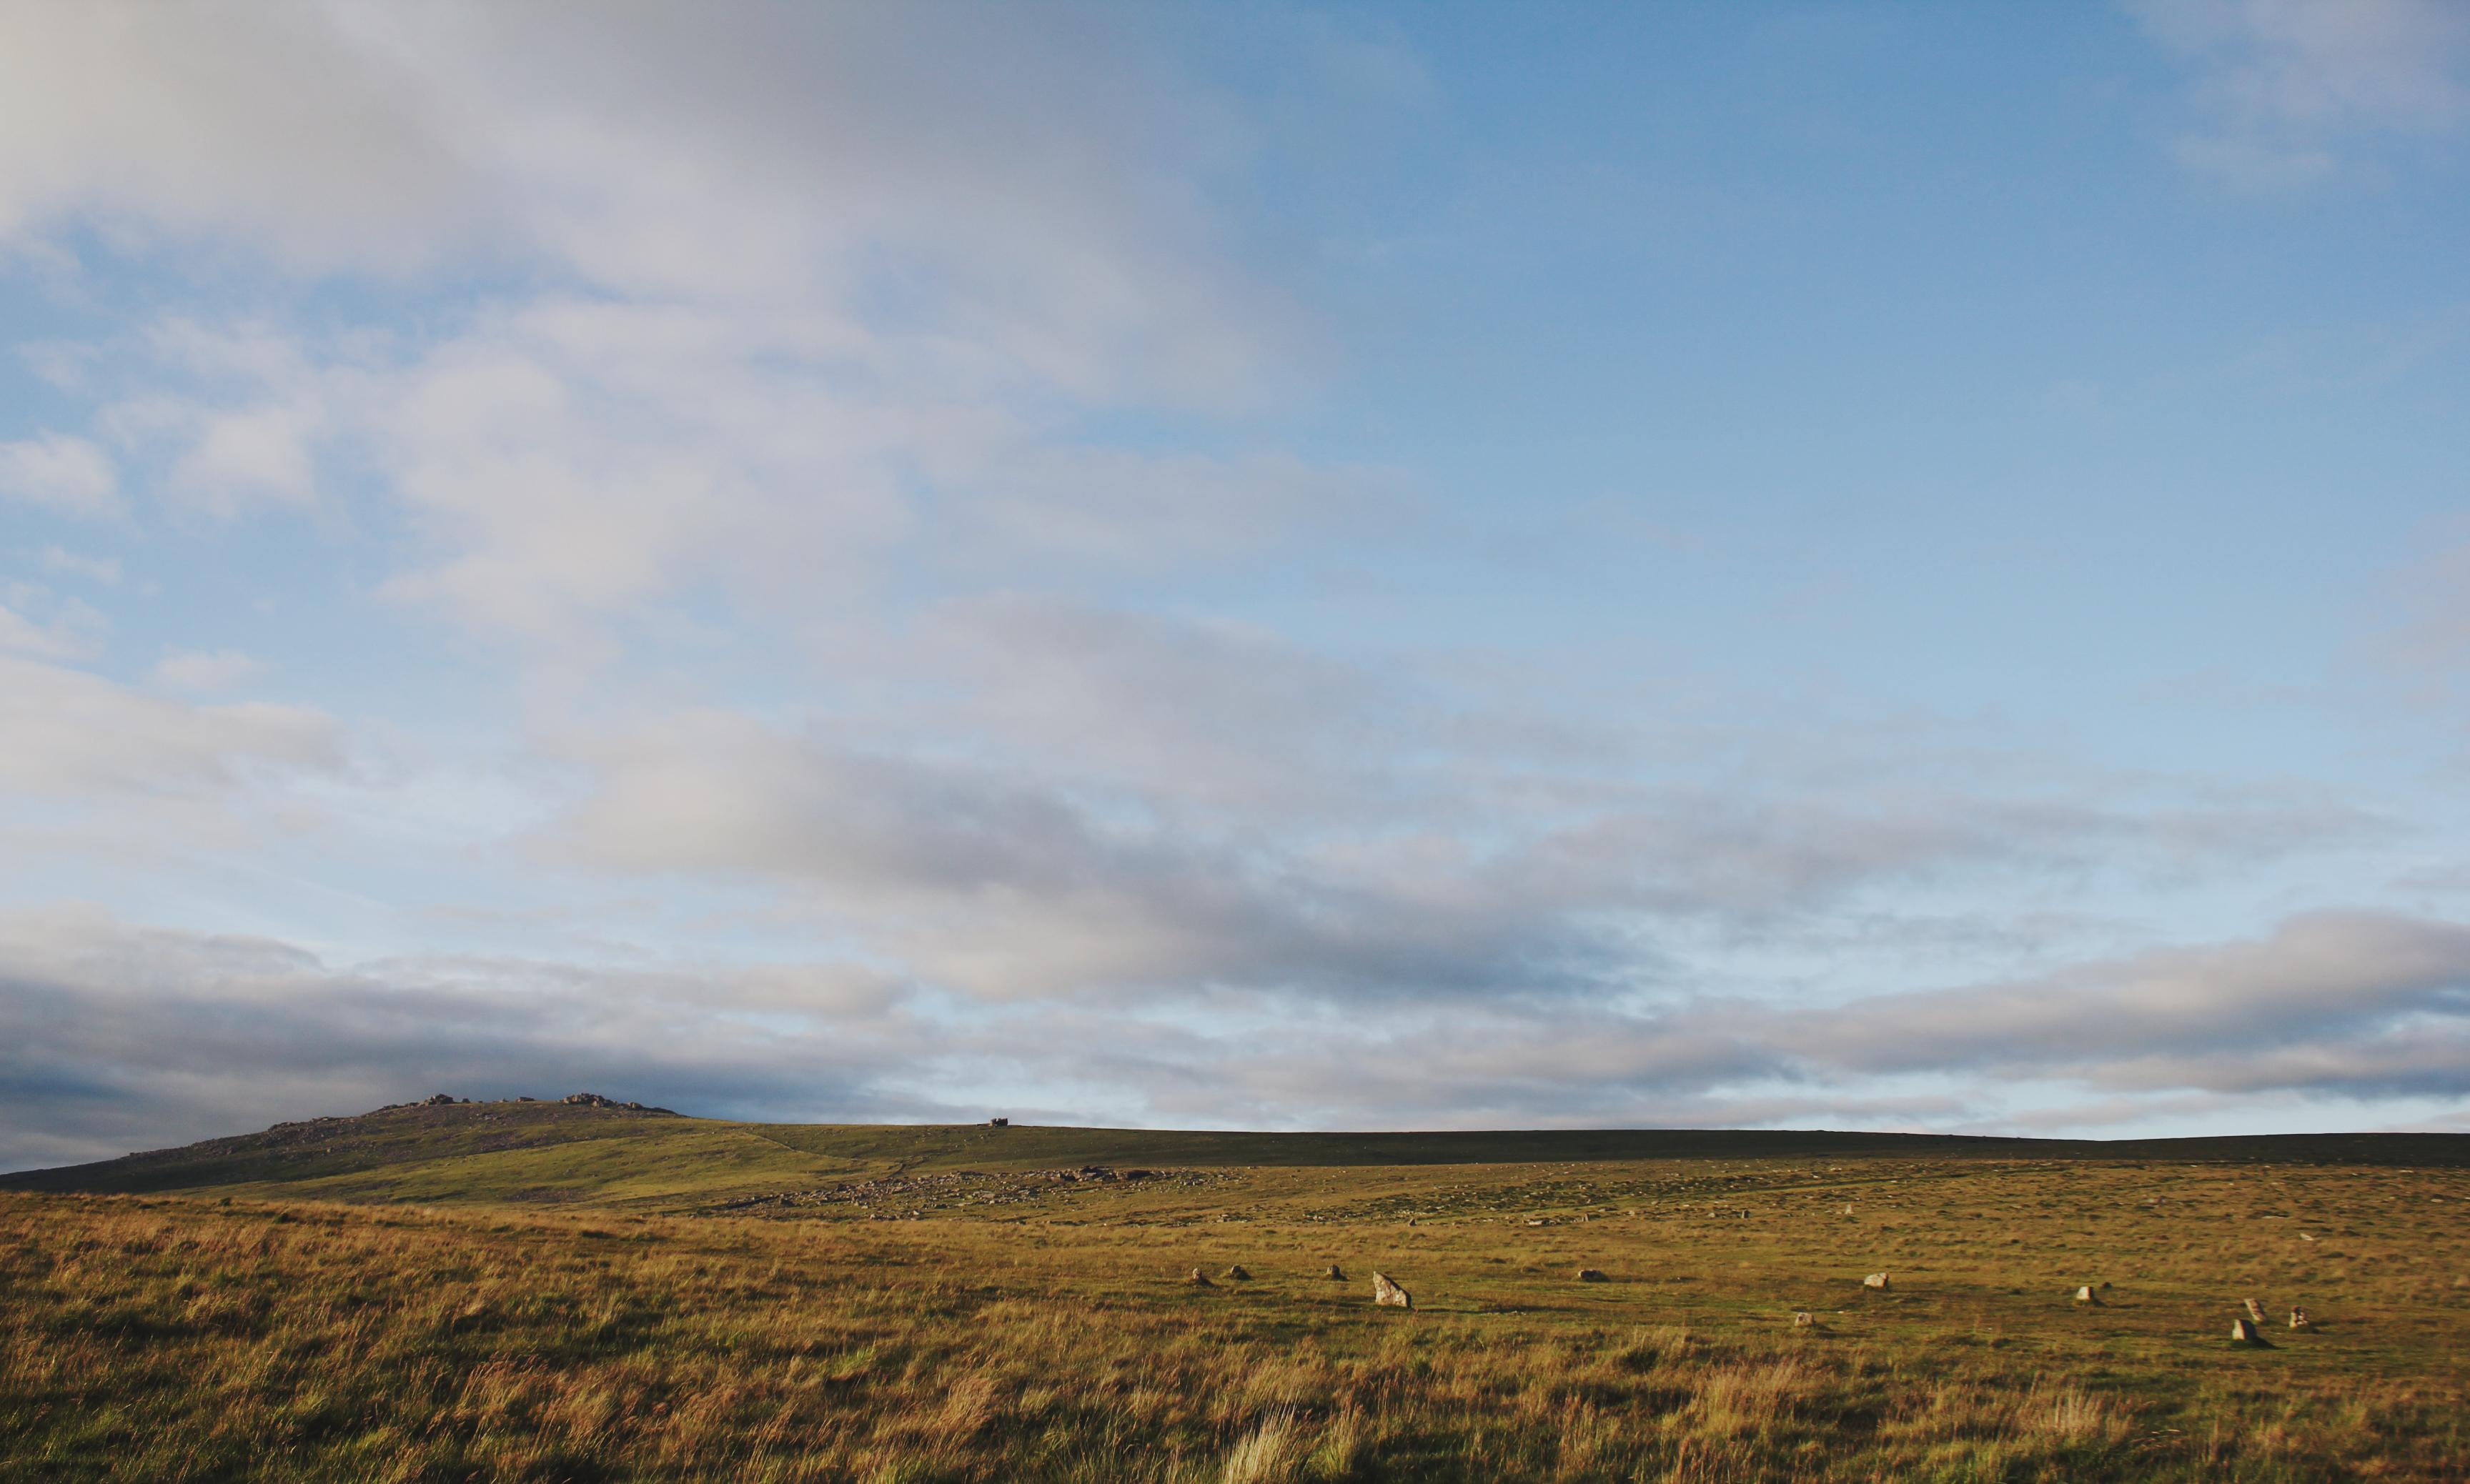 Sunset at Merrivale Stone Circle, Dartmoor